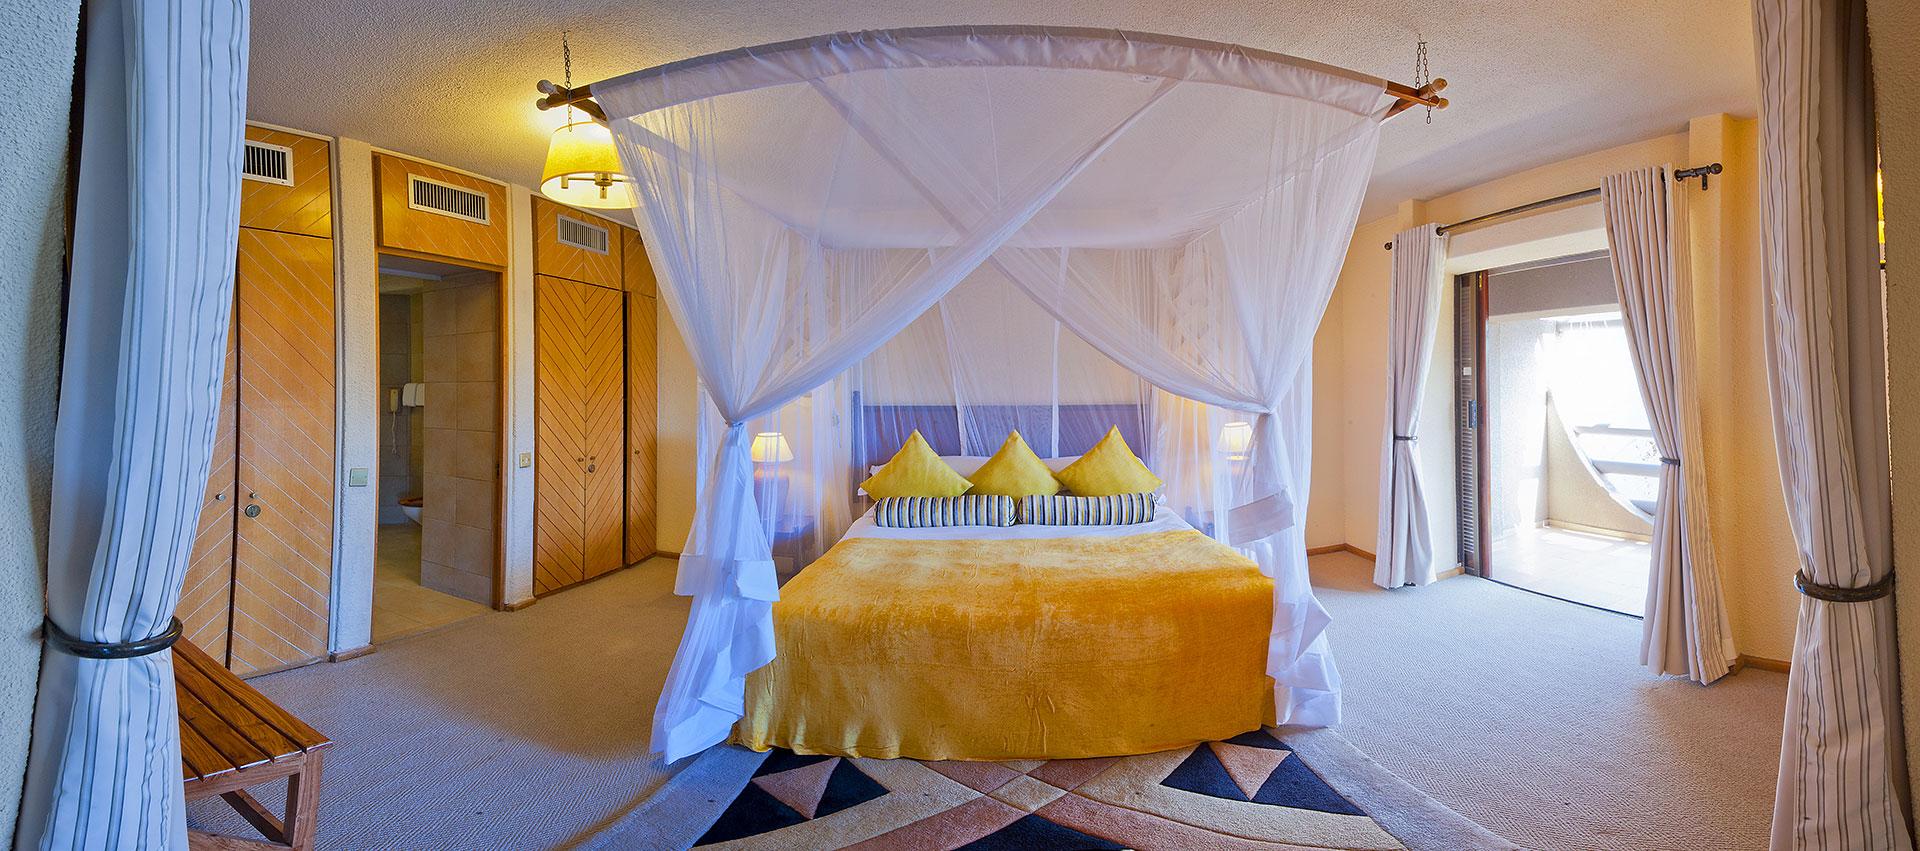 Zimbabwe 5 Star Hotels Rouydadnews Info